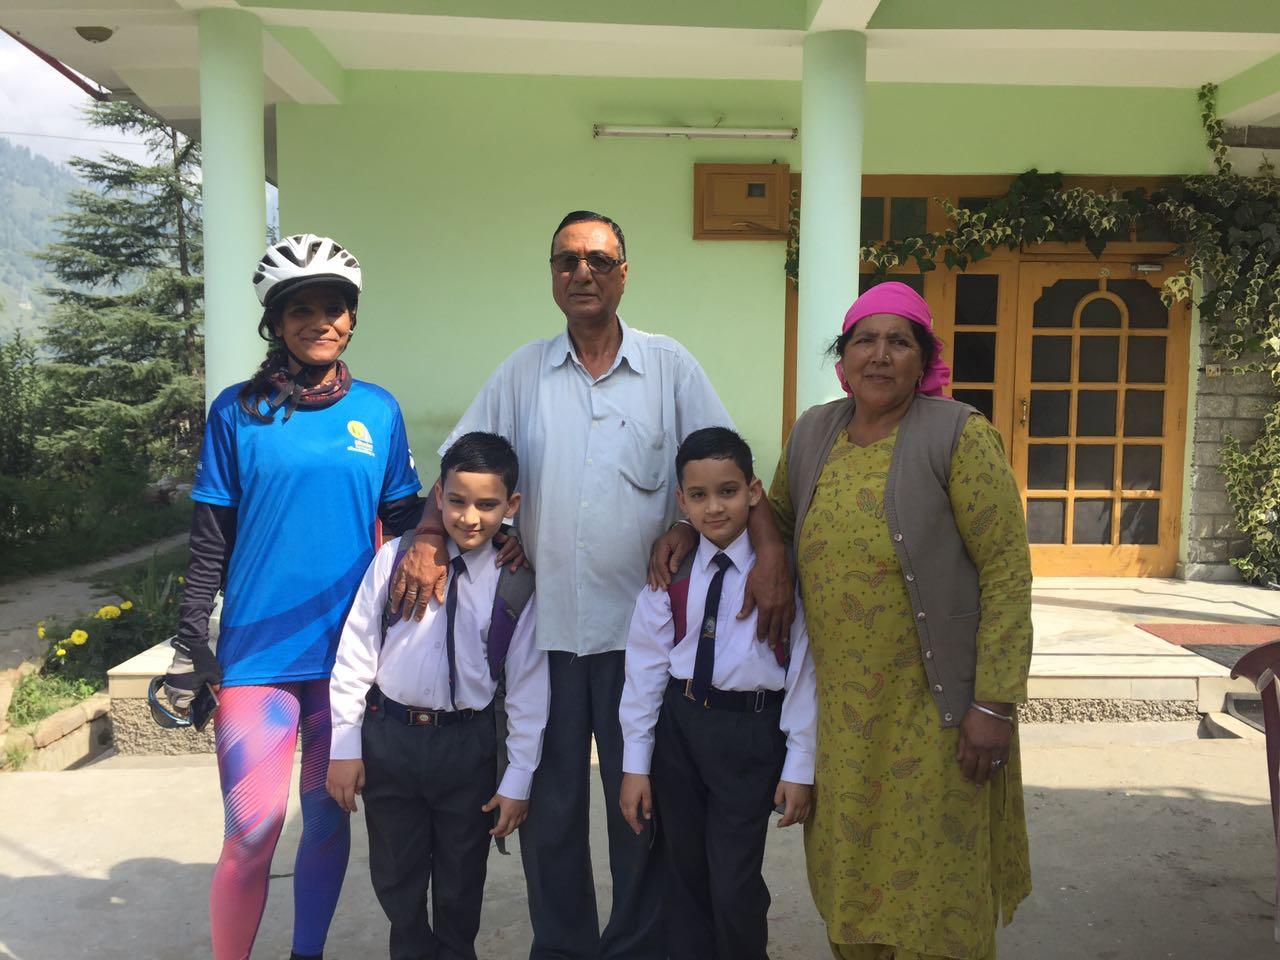 Sunita Singh Choken - Solo Cycling EXpedition